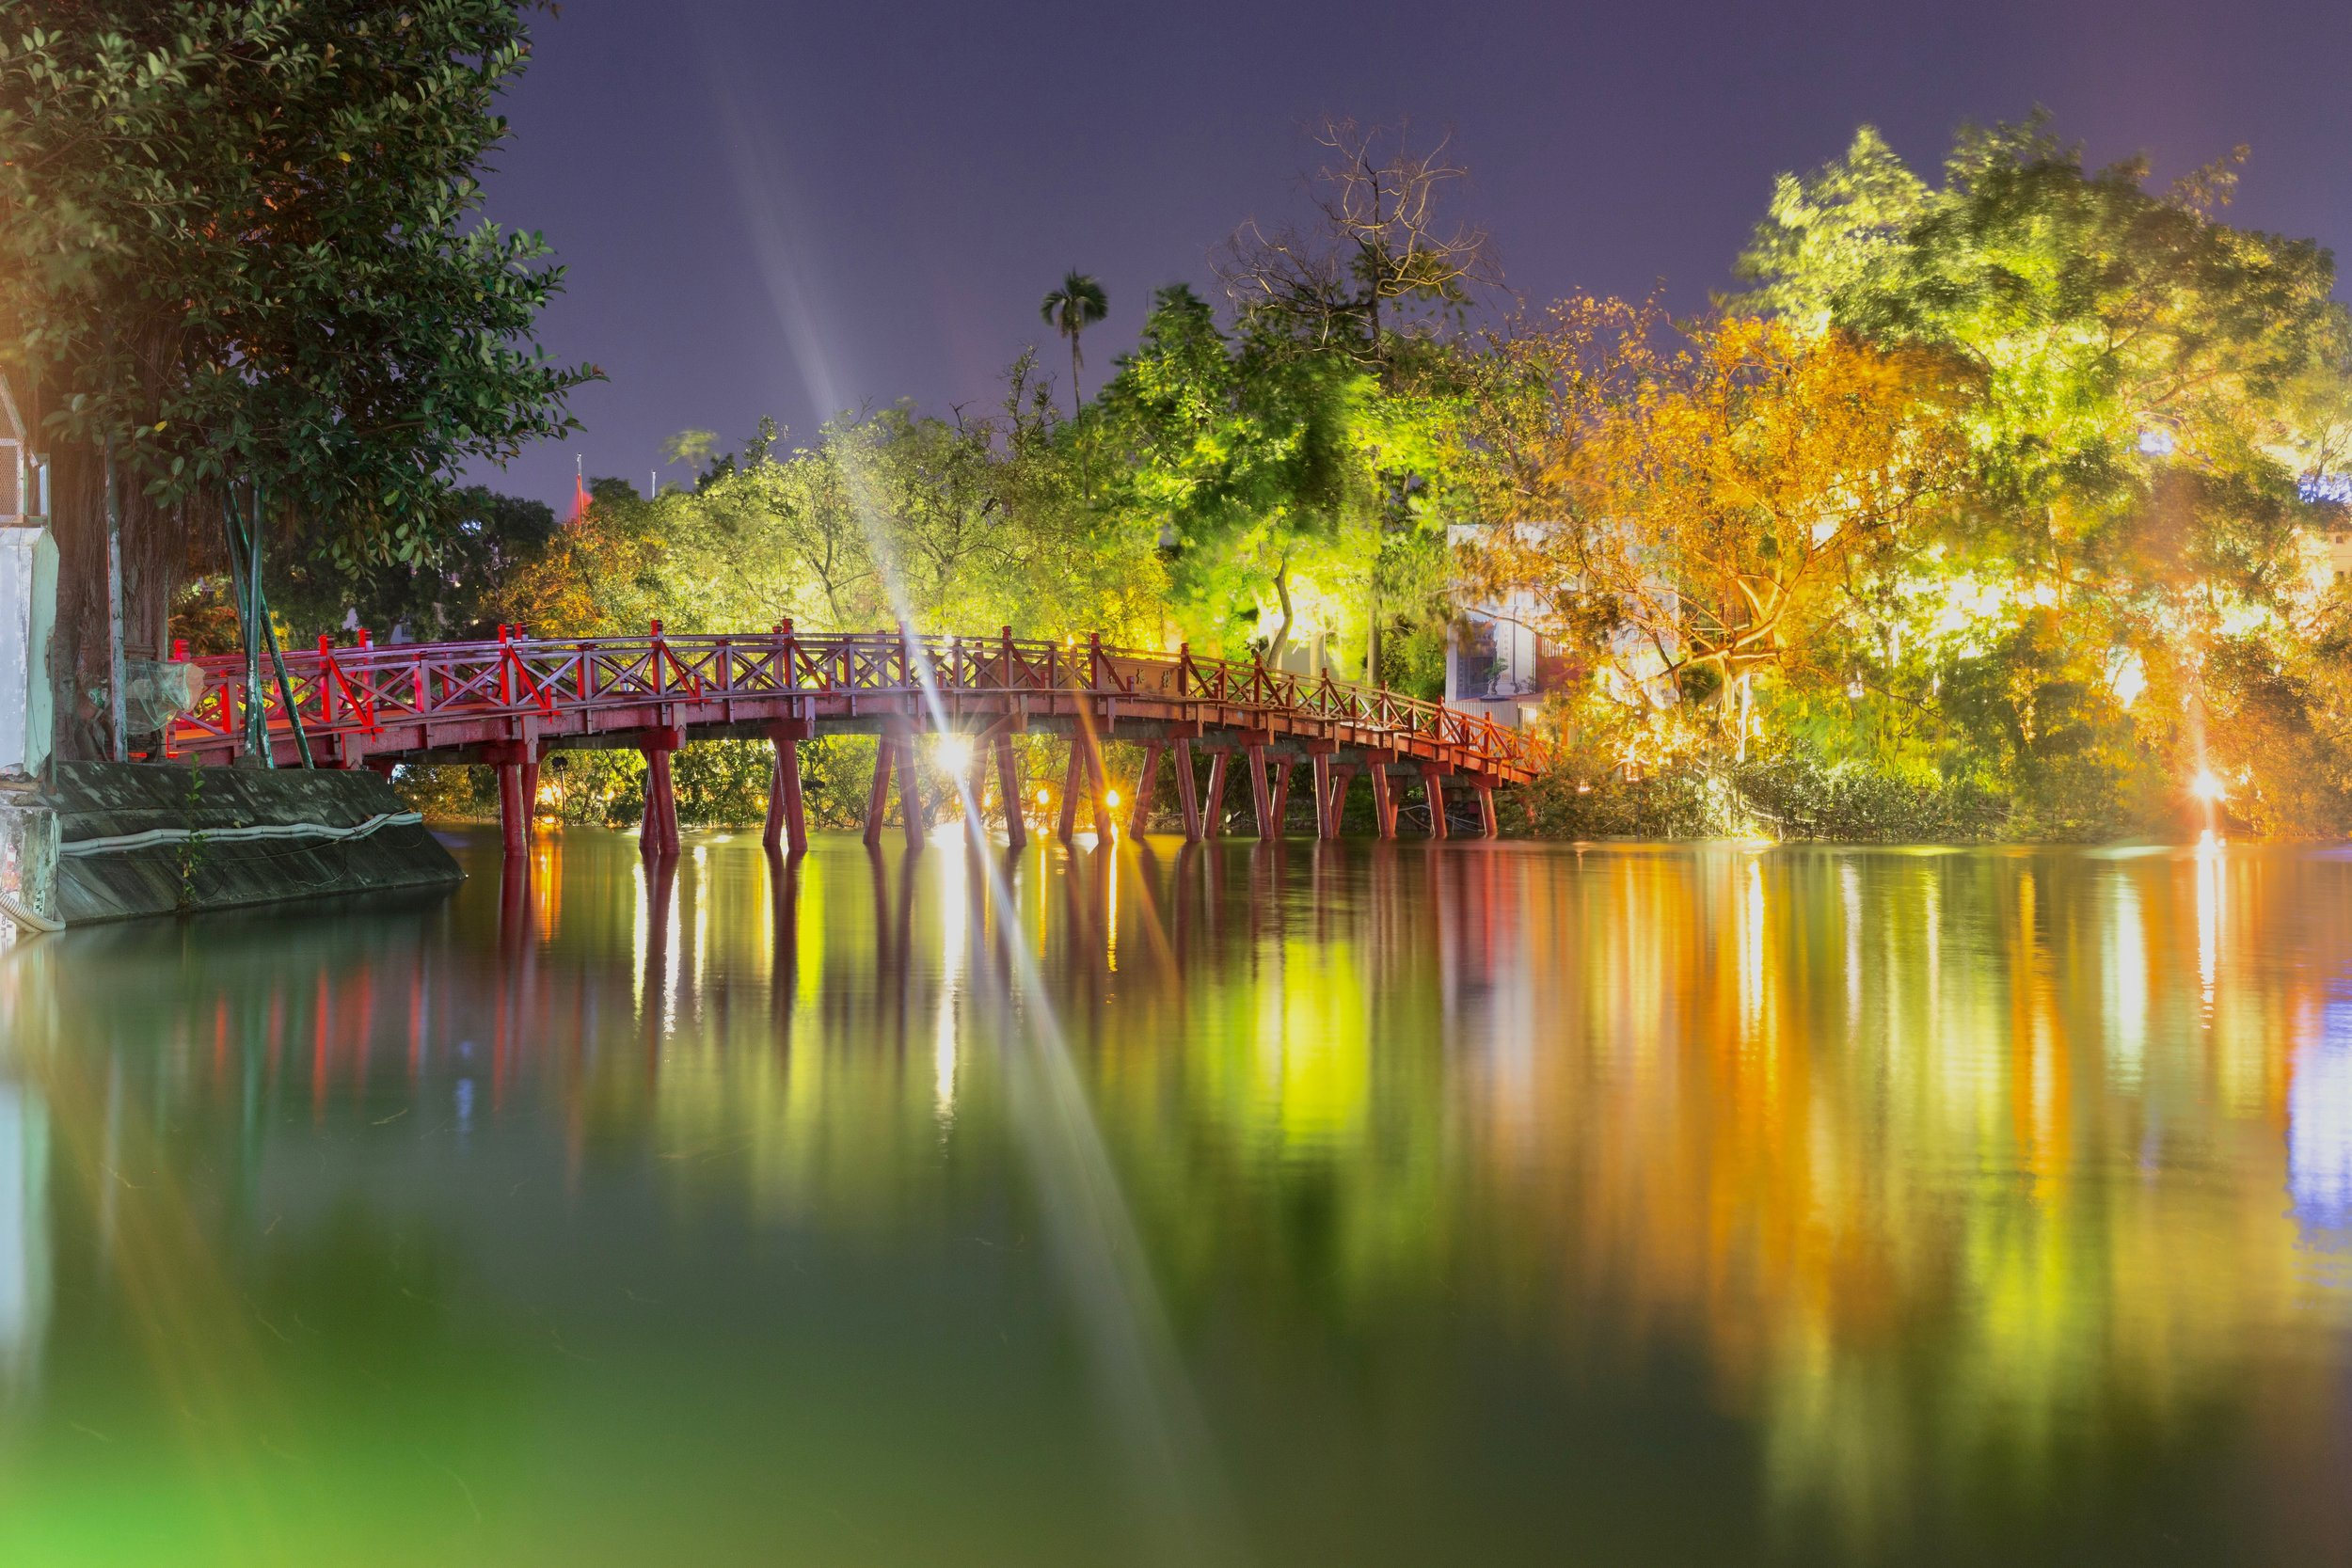 Bridge over Hoan Kiem Lake, Hanoi